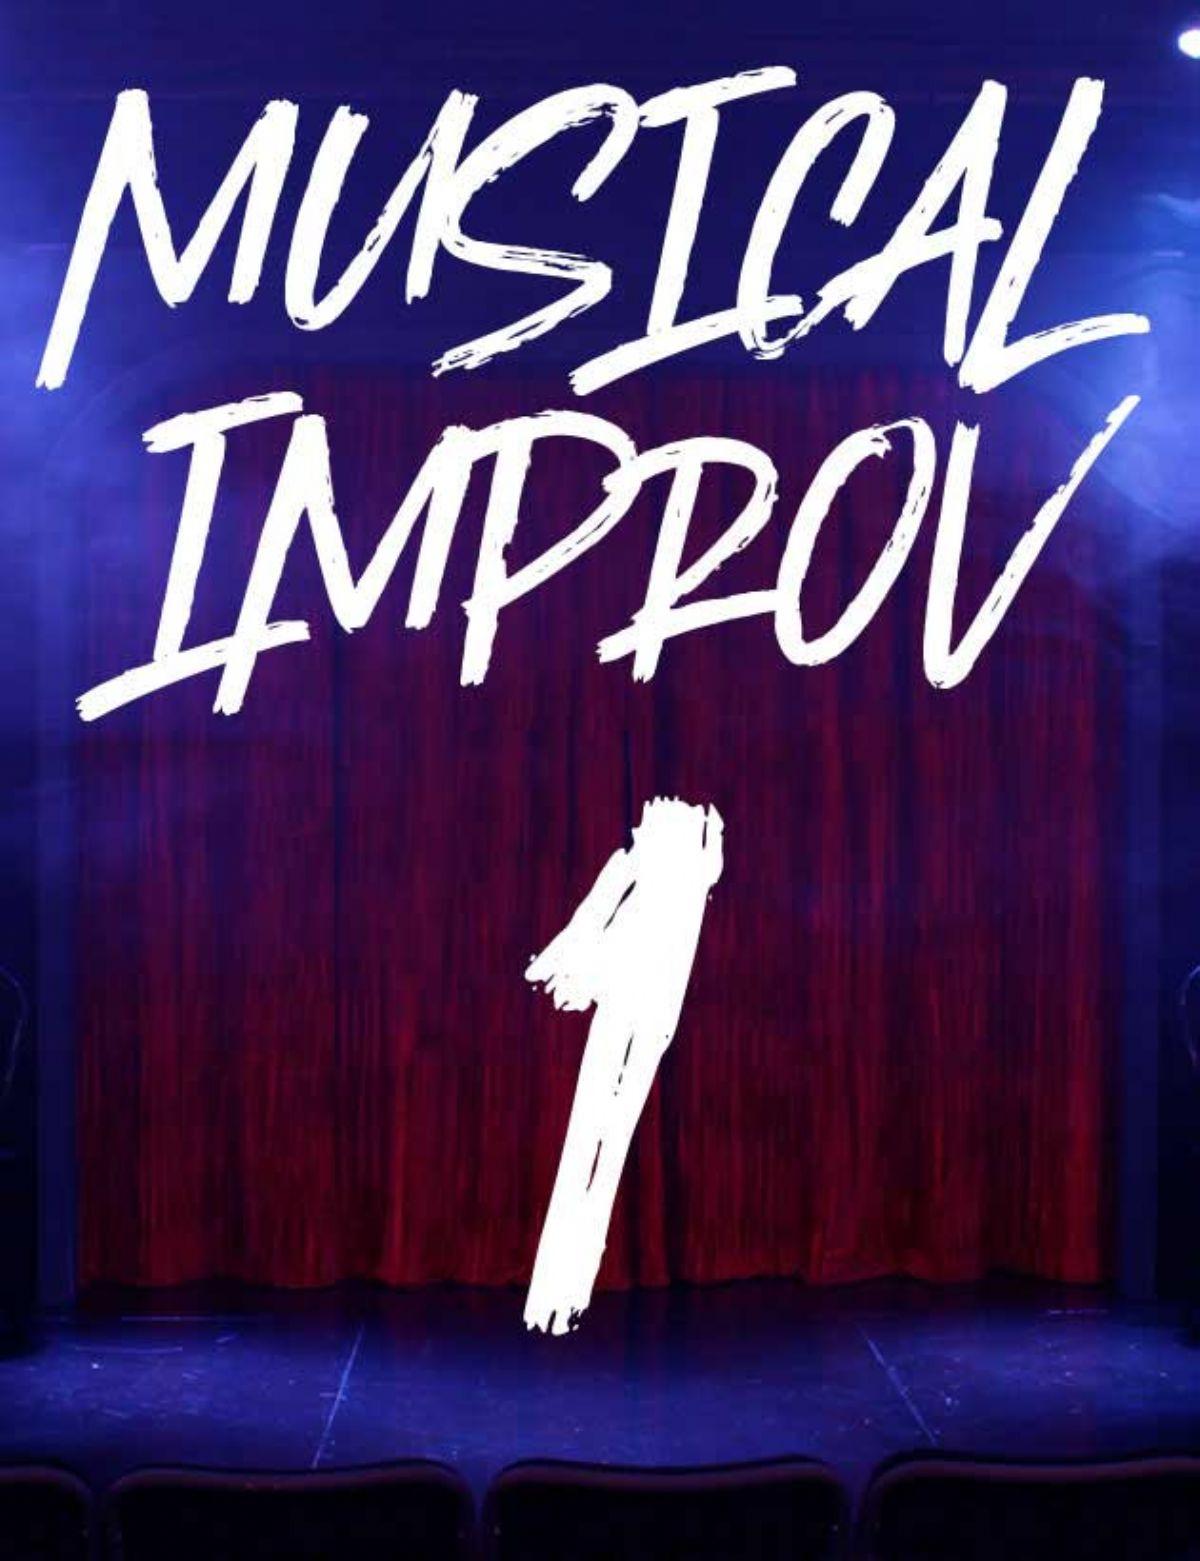 CLASS: Musical Improv 1 w/ Mark, Tuesdays (2020-3)